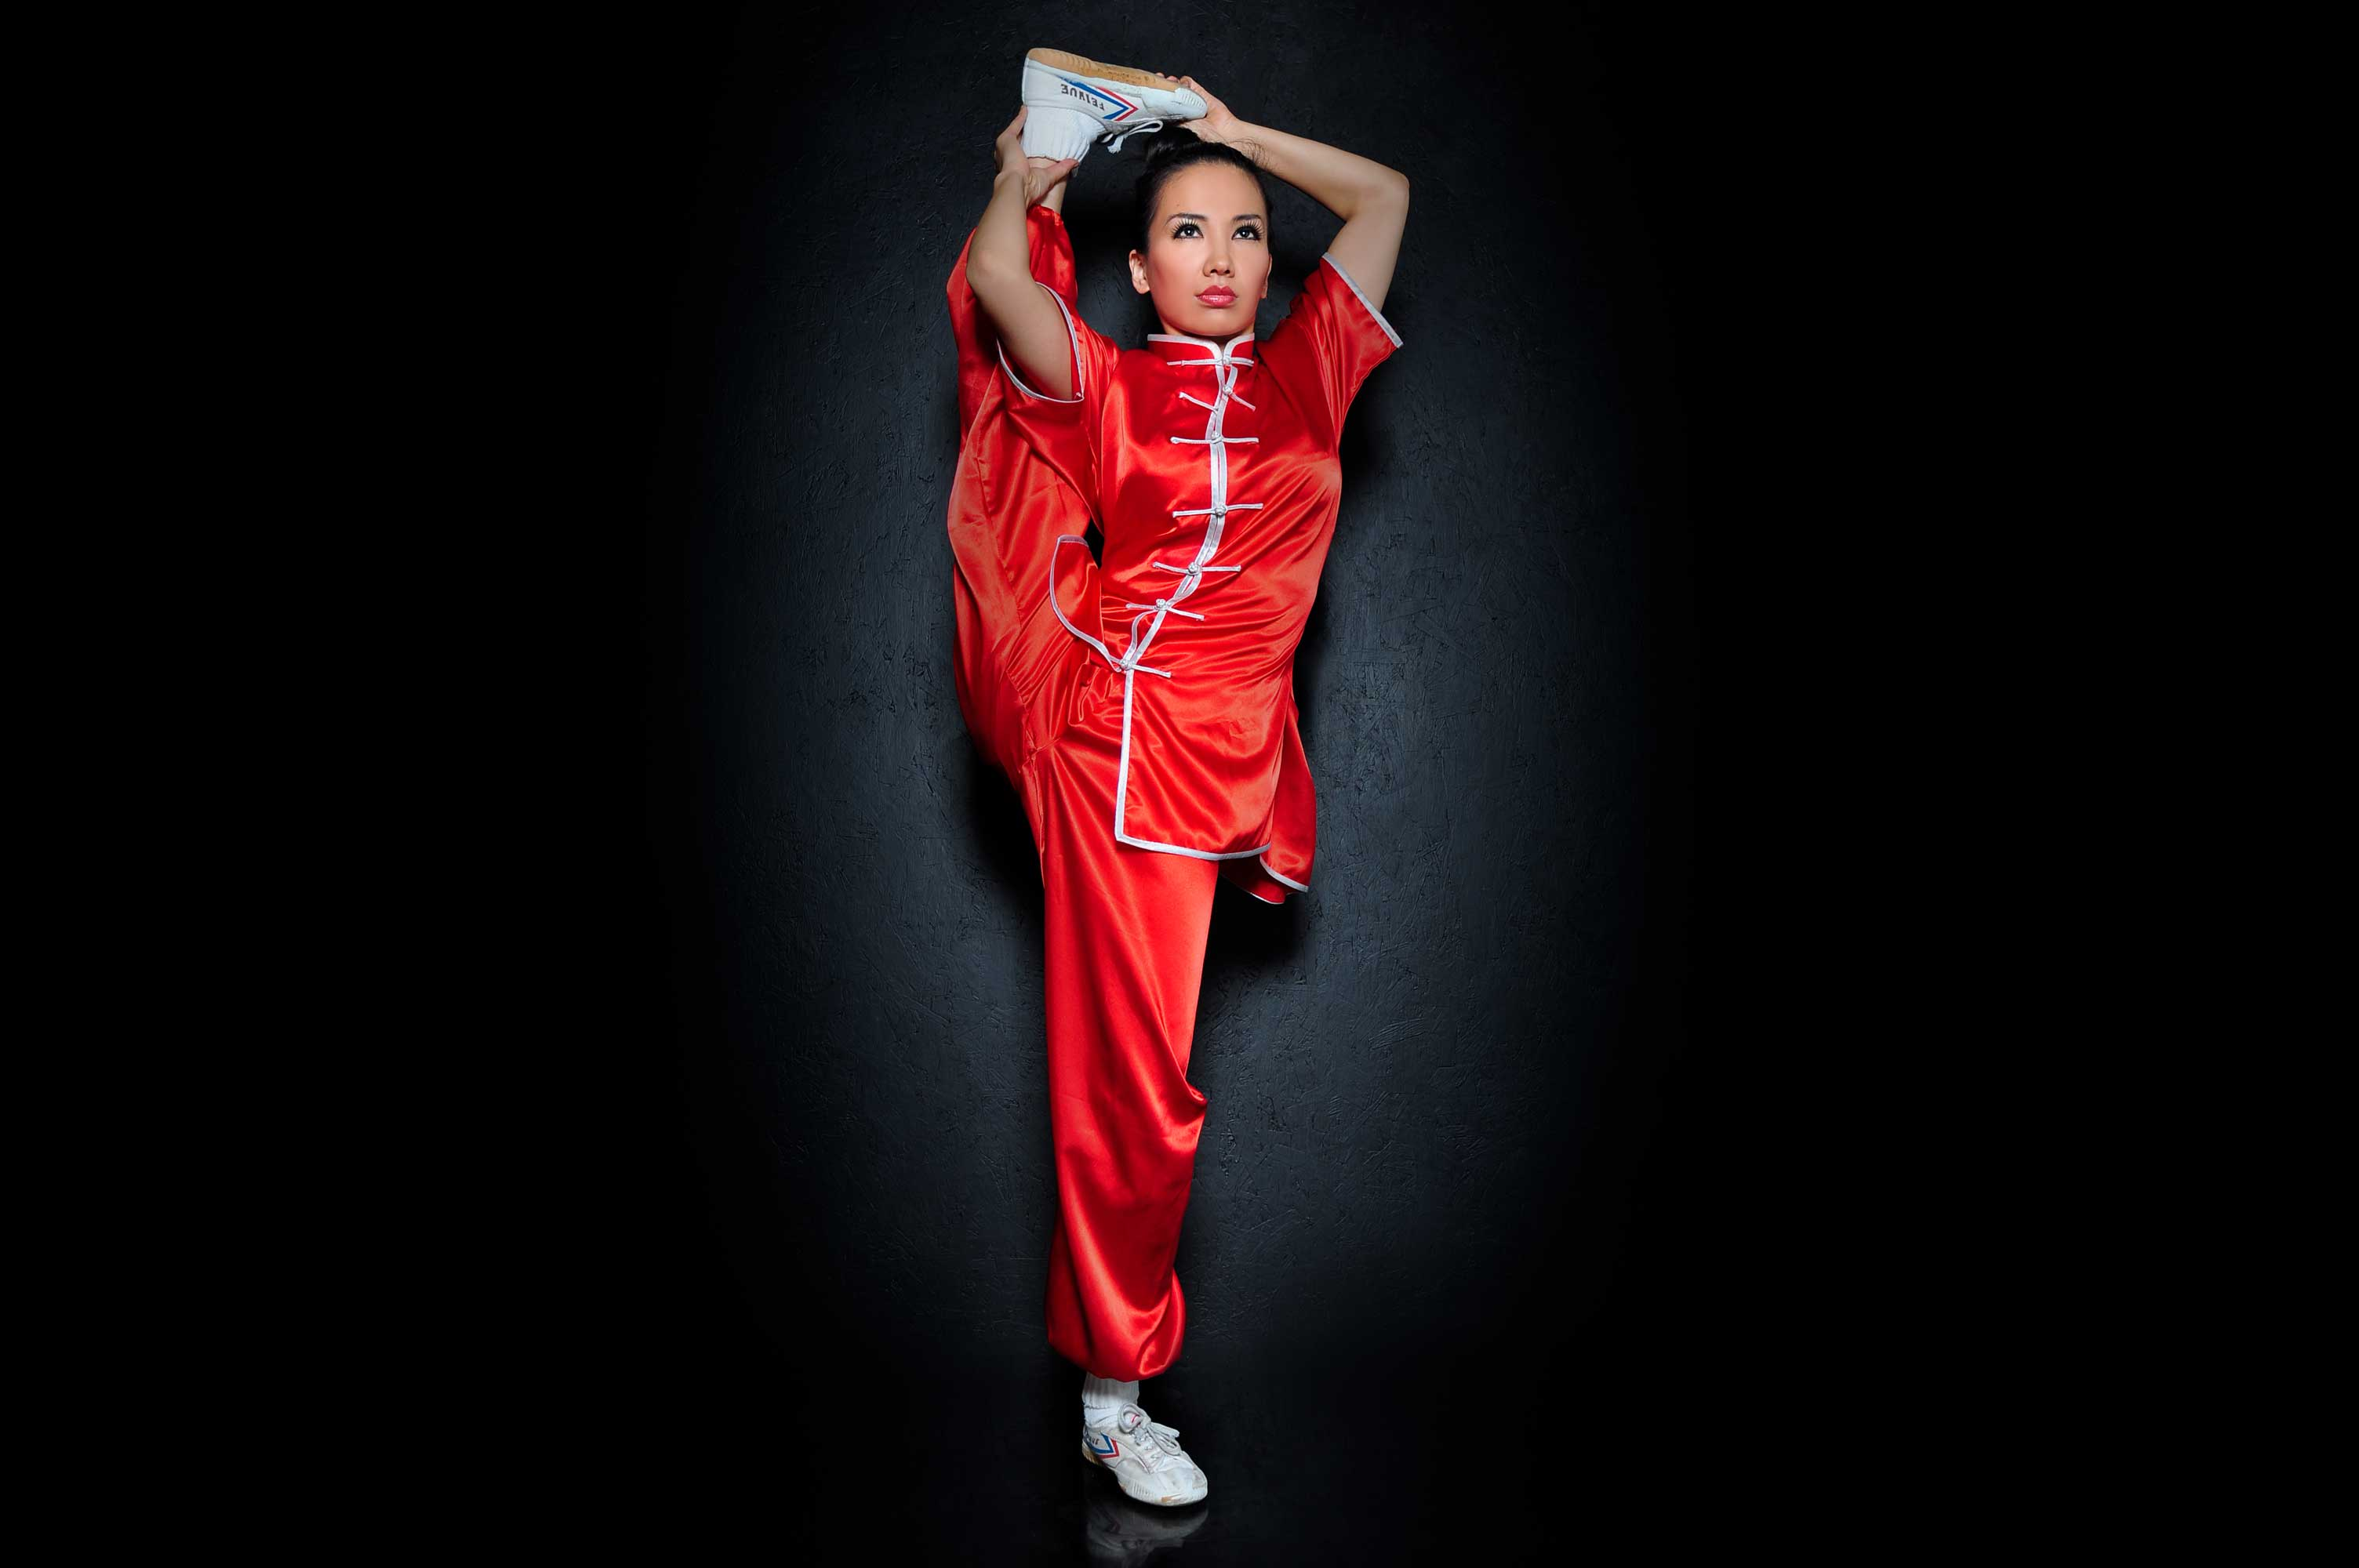 Multi-Skilled Martial Artist